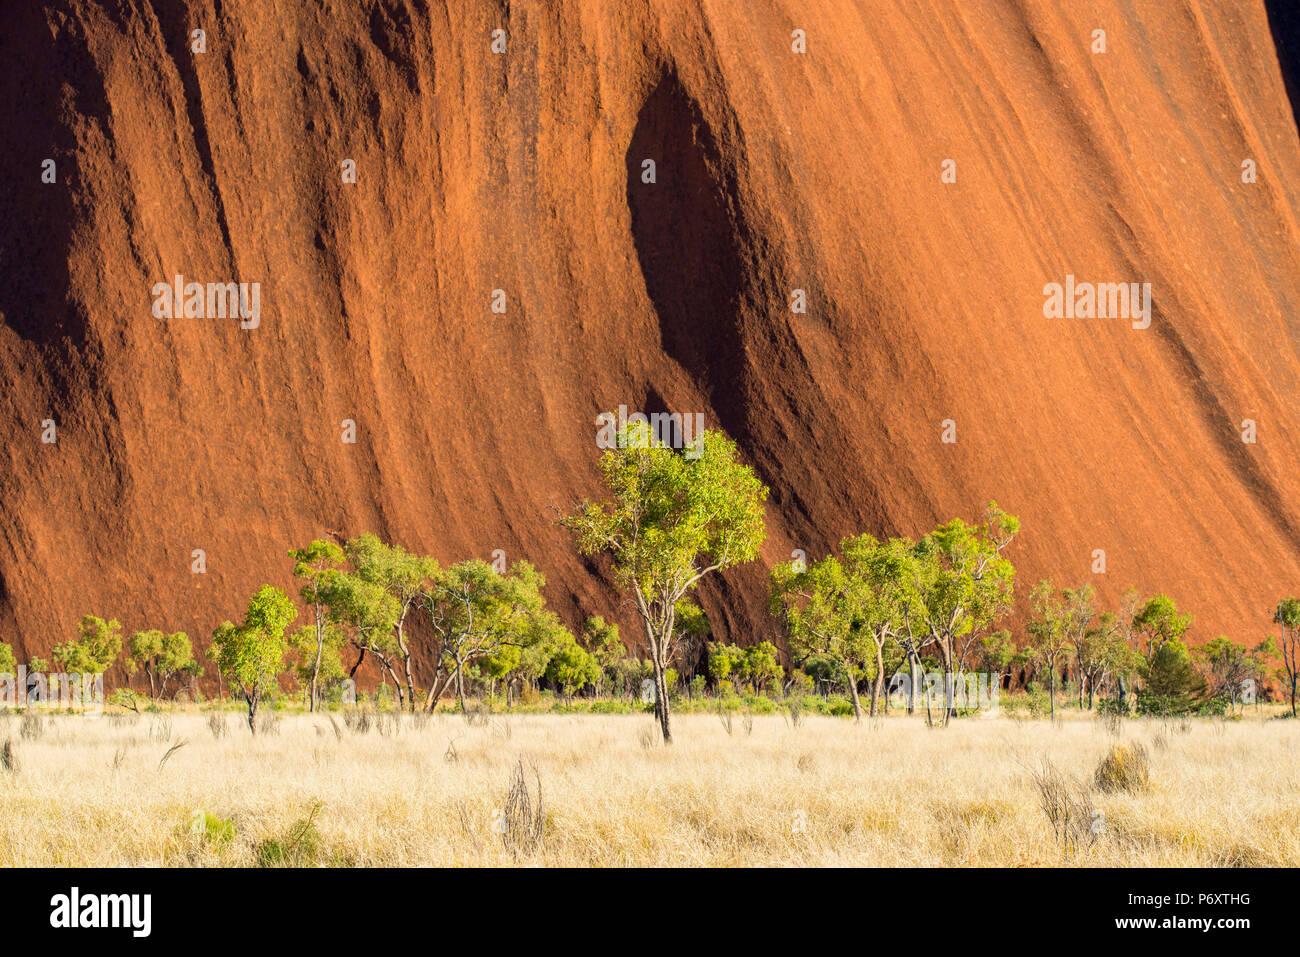 Uluru (Ayers Rock), le Parc National d'Uluru-Kata Tjuta, Territoire du Nord, Centre de l'Australie, l'Australie. Photo Stock